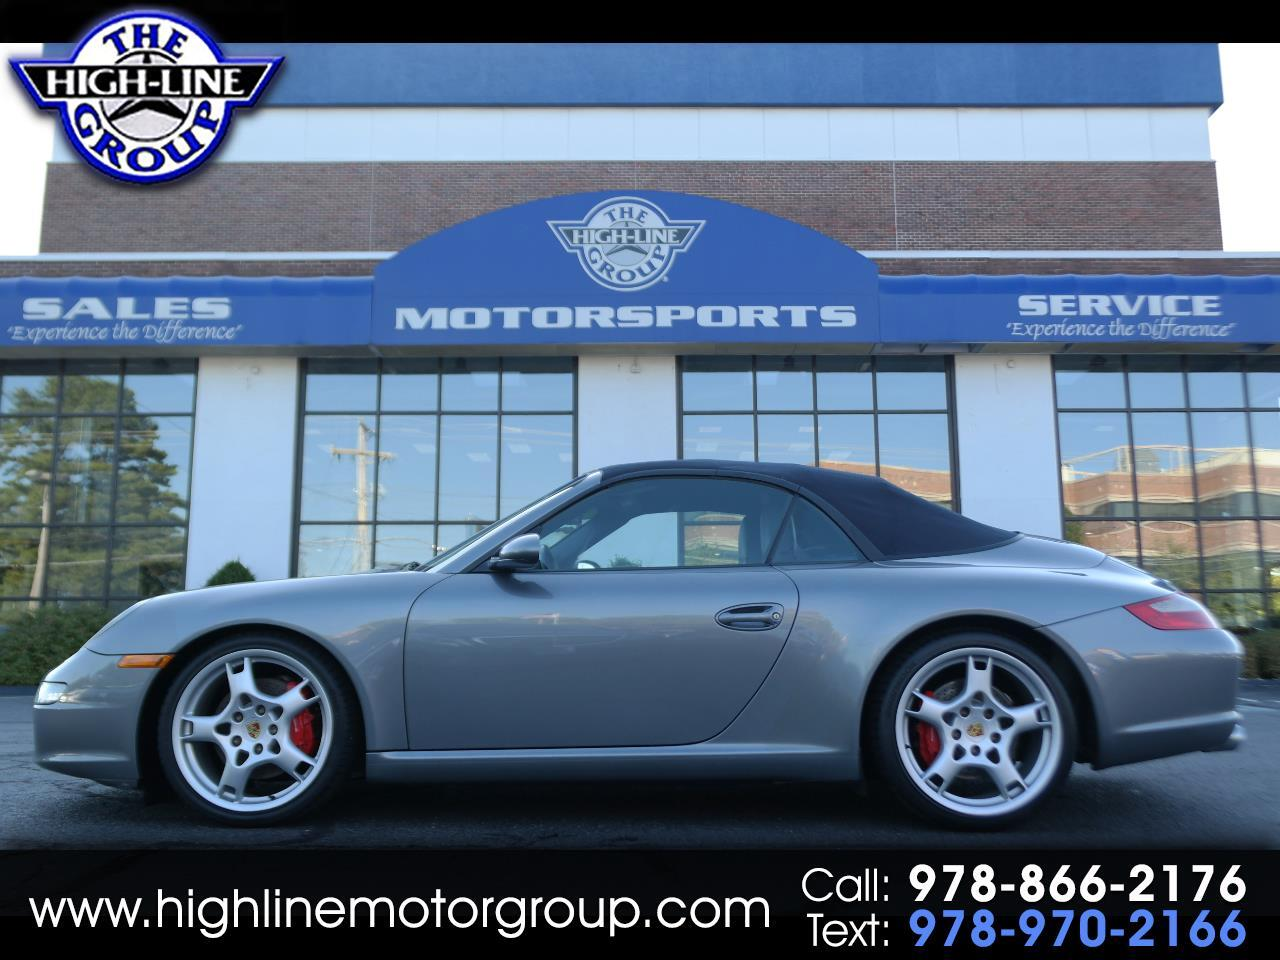 2006 Porsche 911 2dr Cabriolet Carrera S